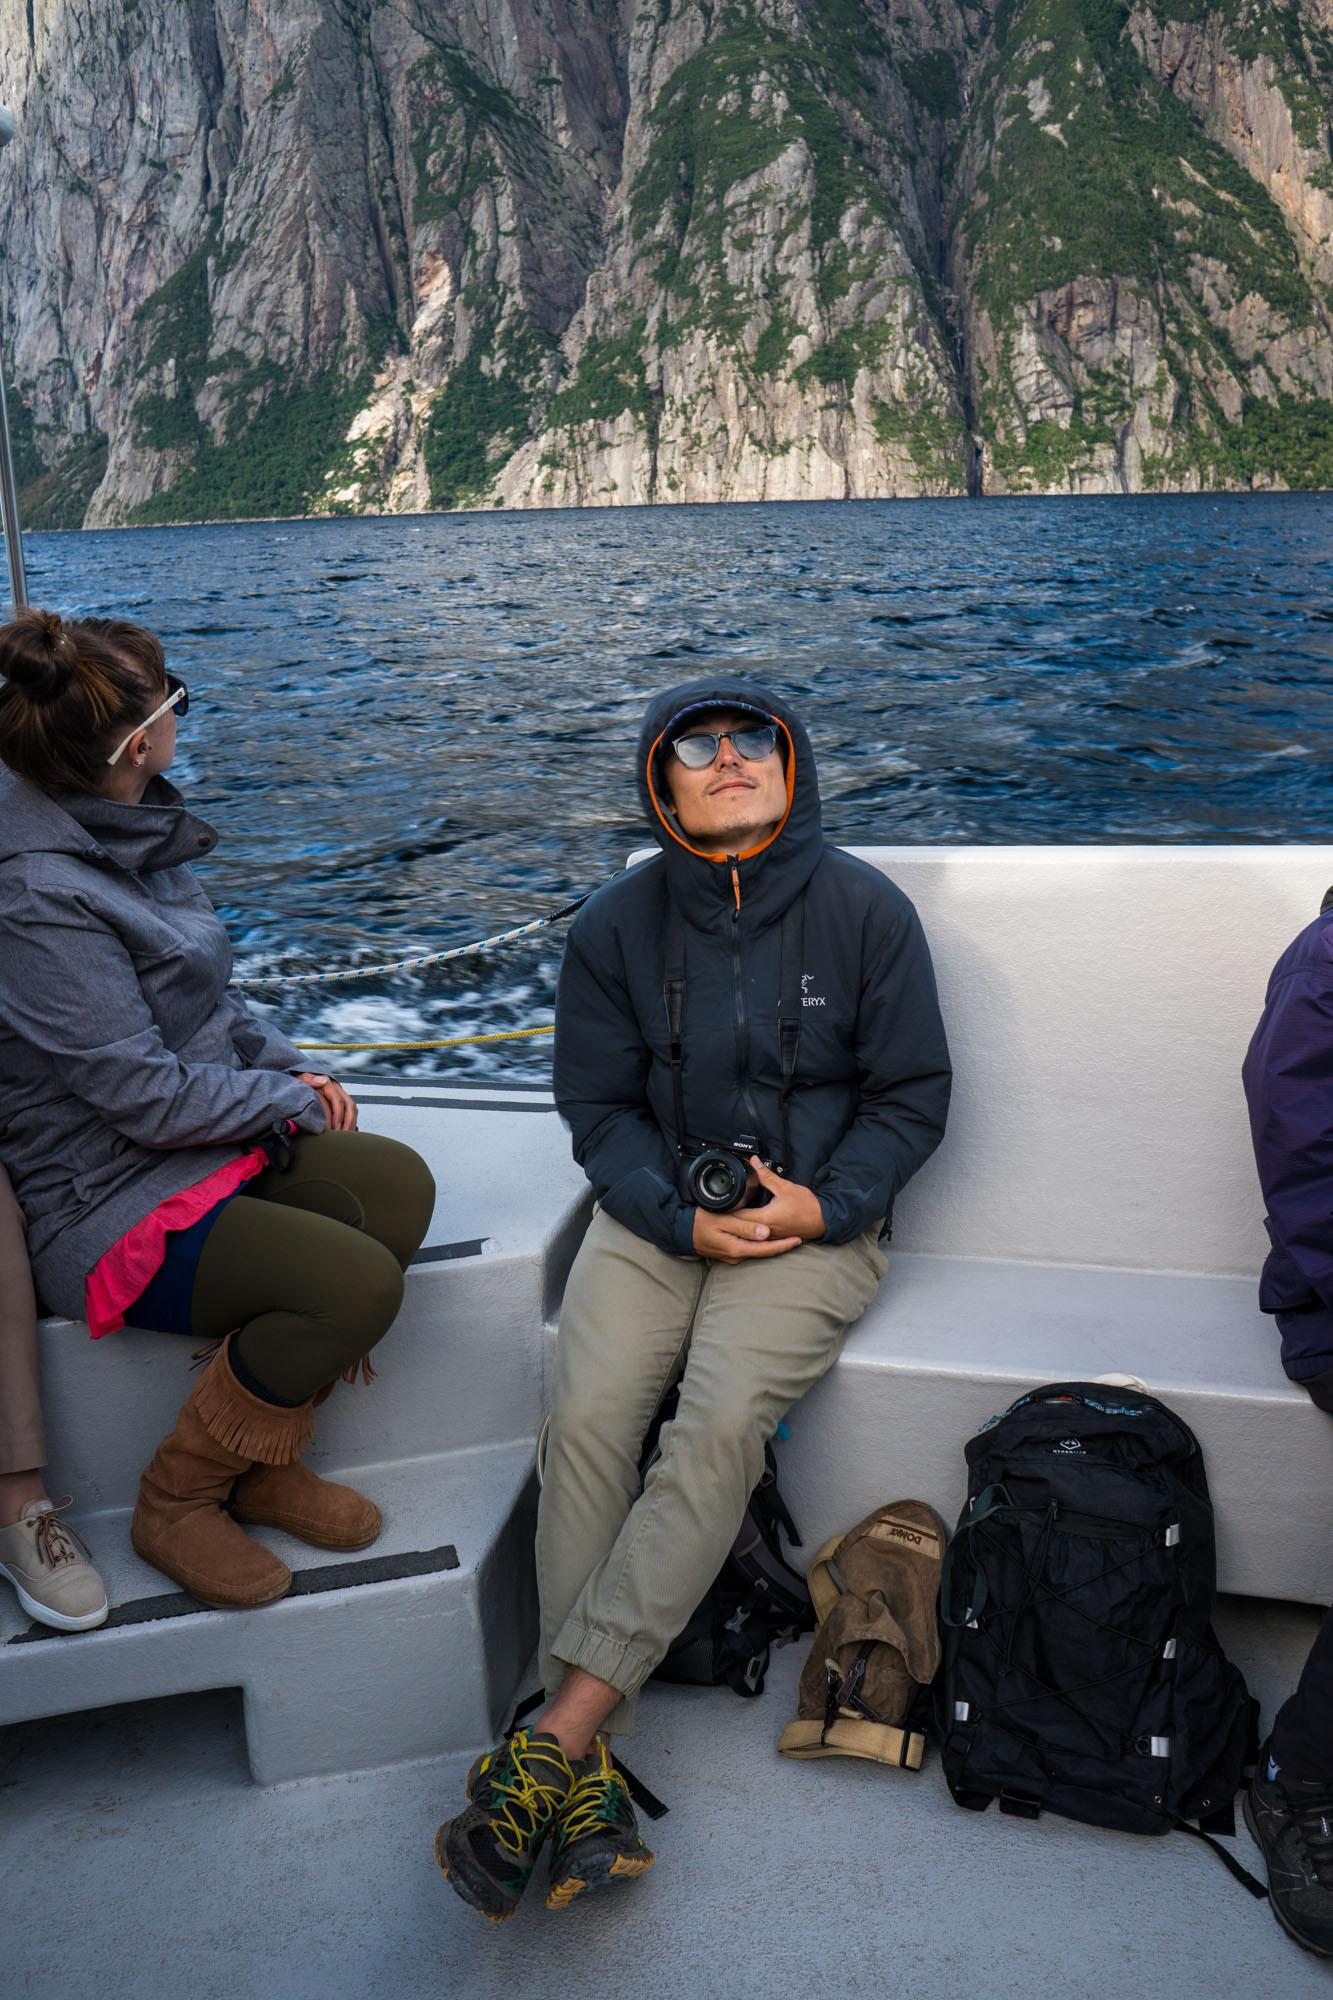 Owen onboard the tour boat